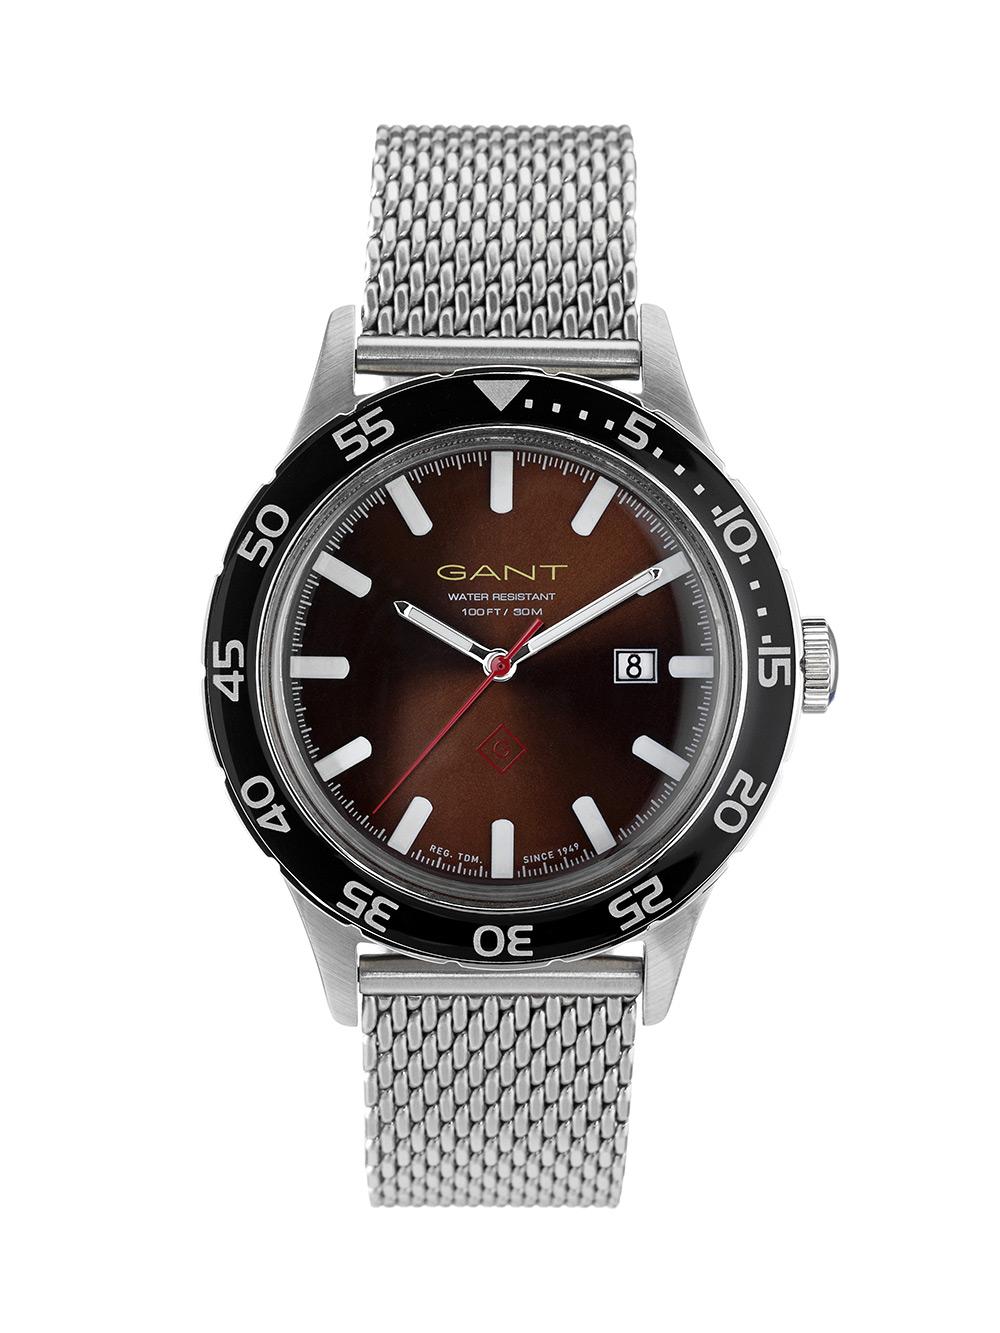 gant-rugger-las-watch-02